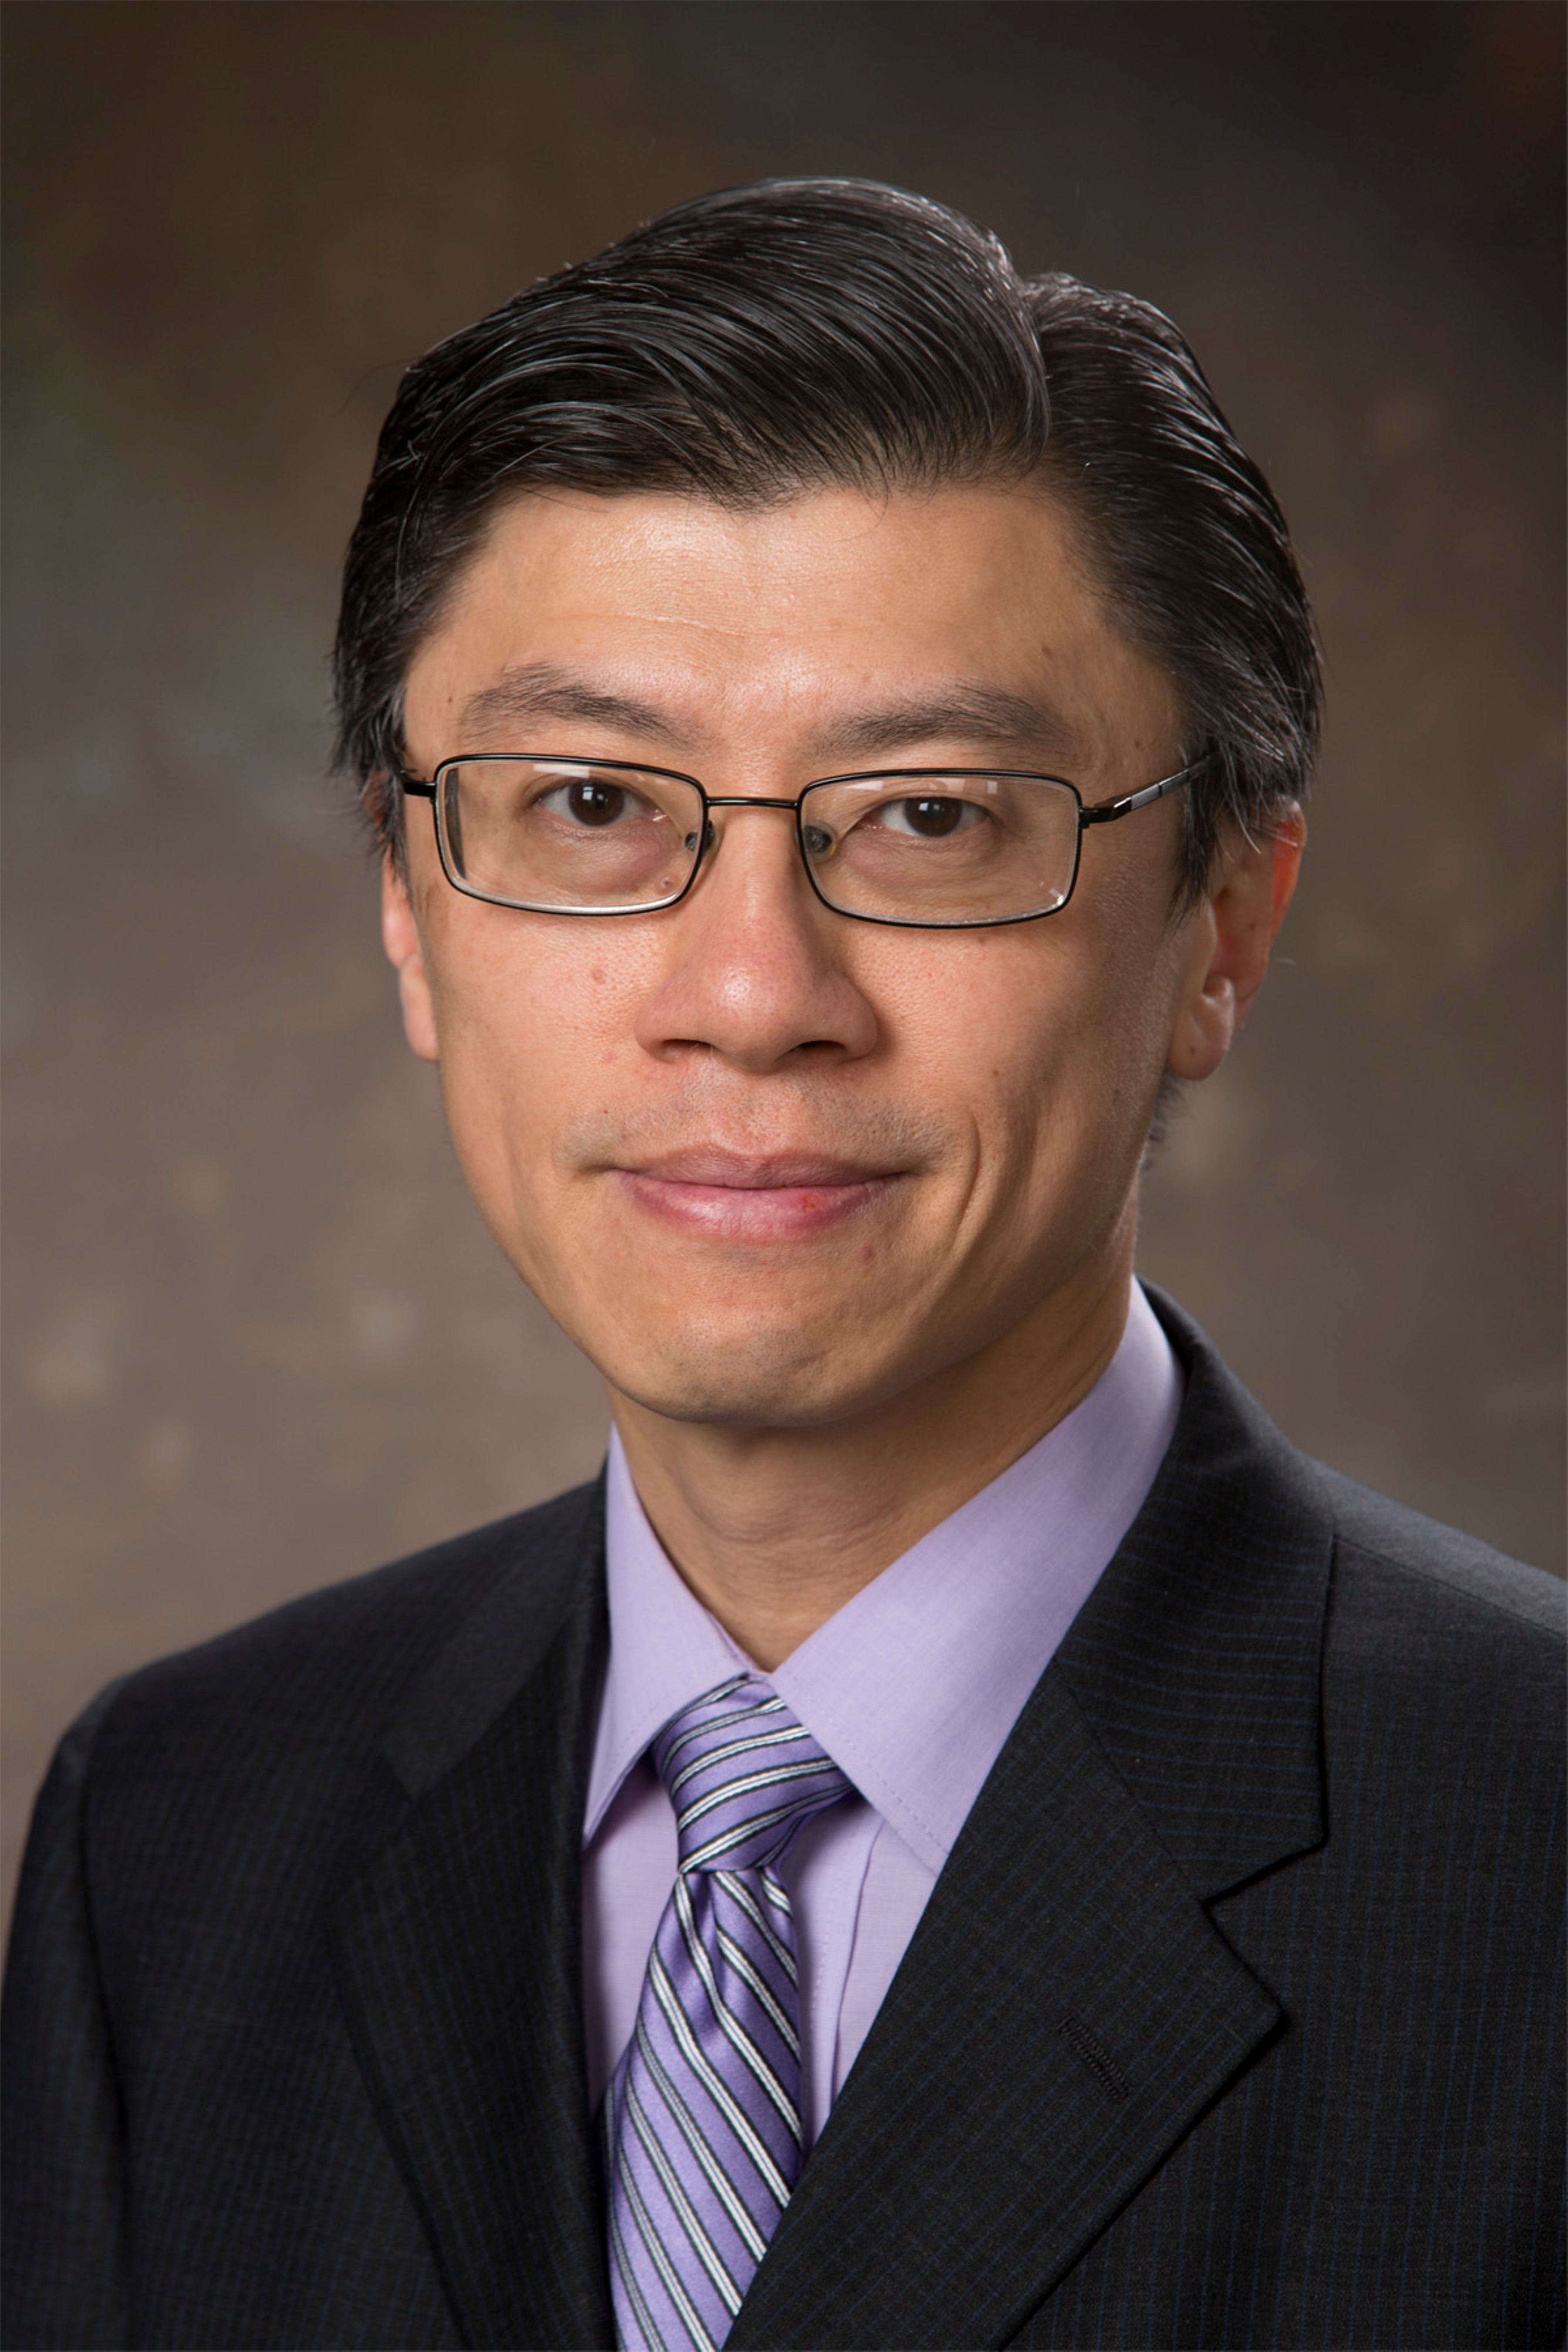 Toby C Chai Md Urology Yale School Of Medicine